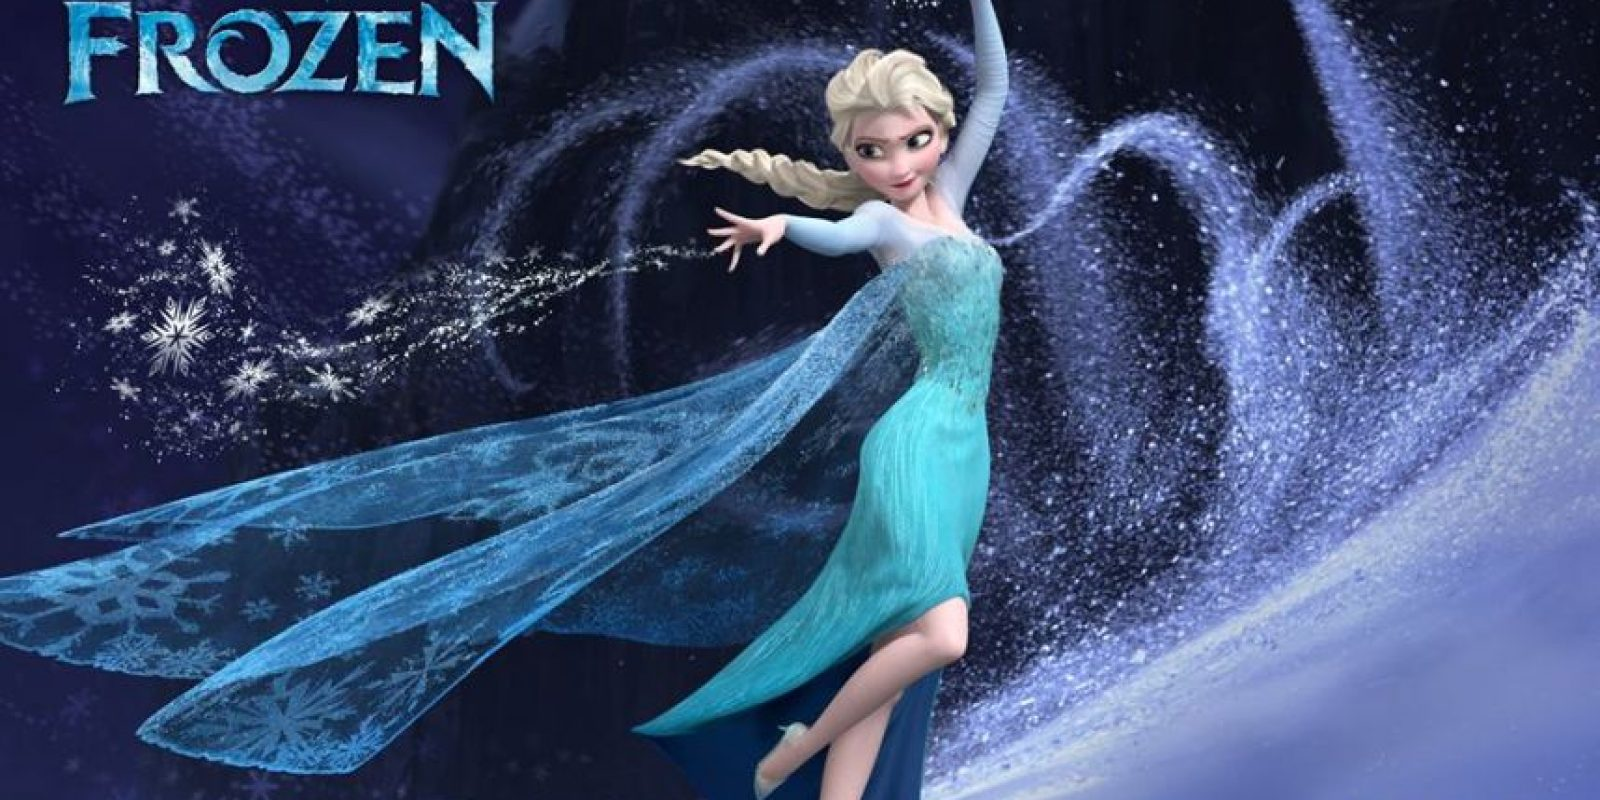 """Elsa"" de la cinta ""Frozen"" Foto:Facebook / Frozen"